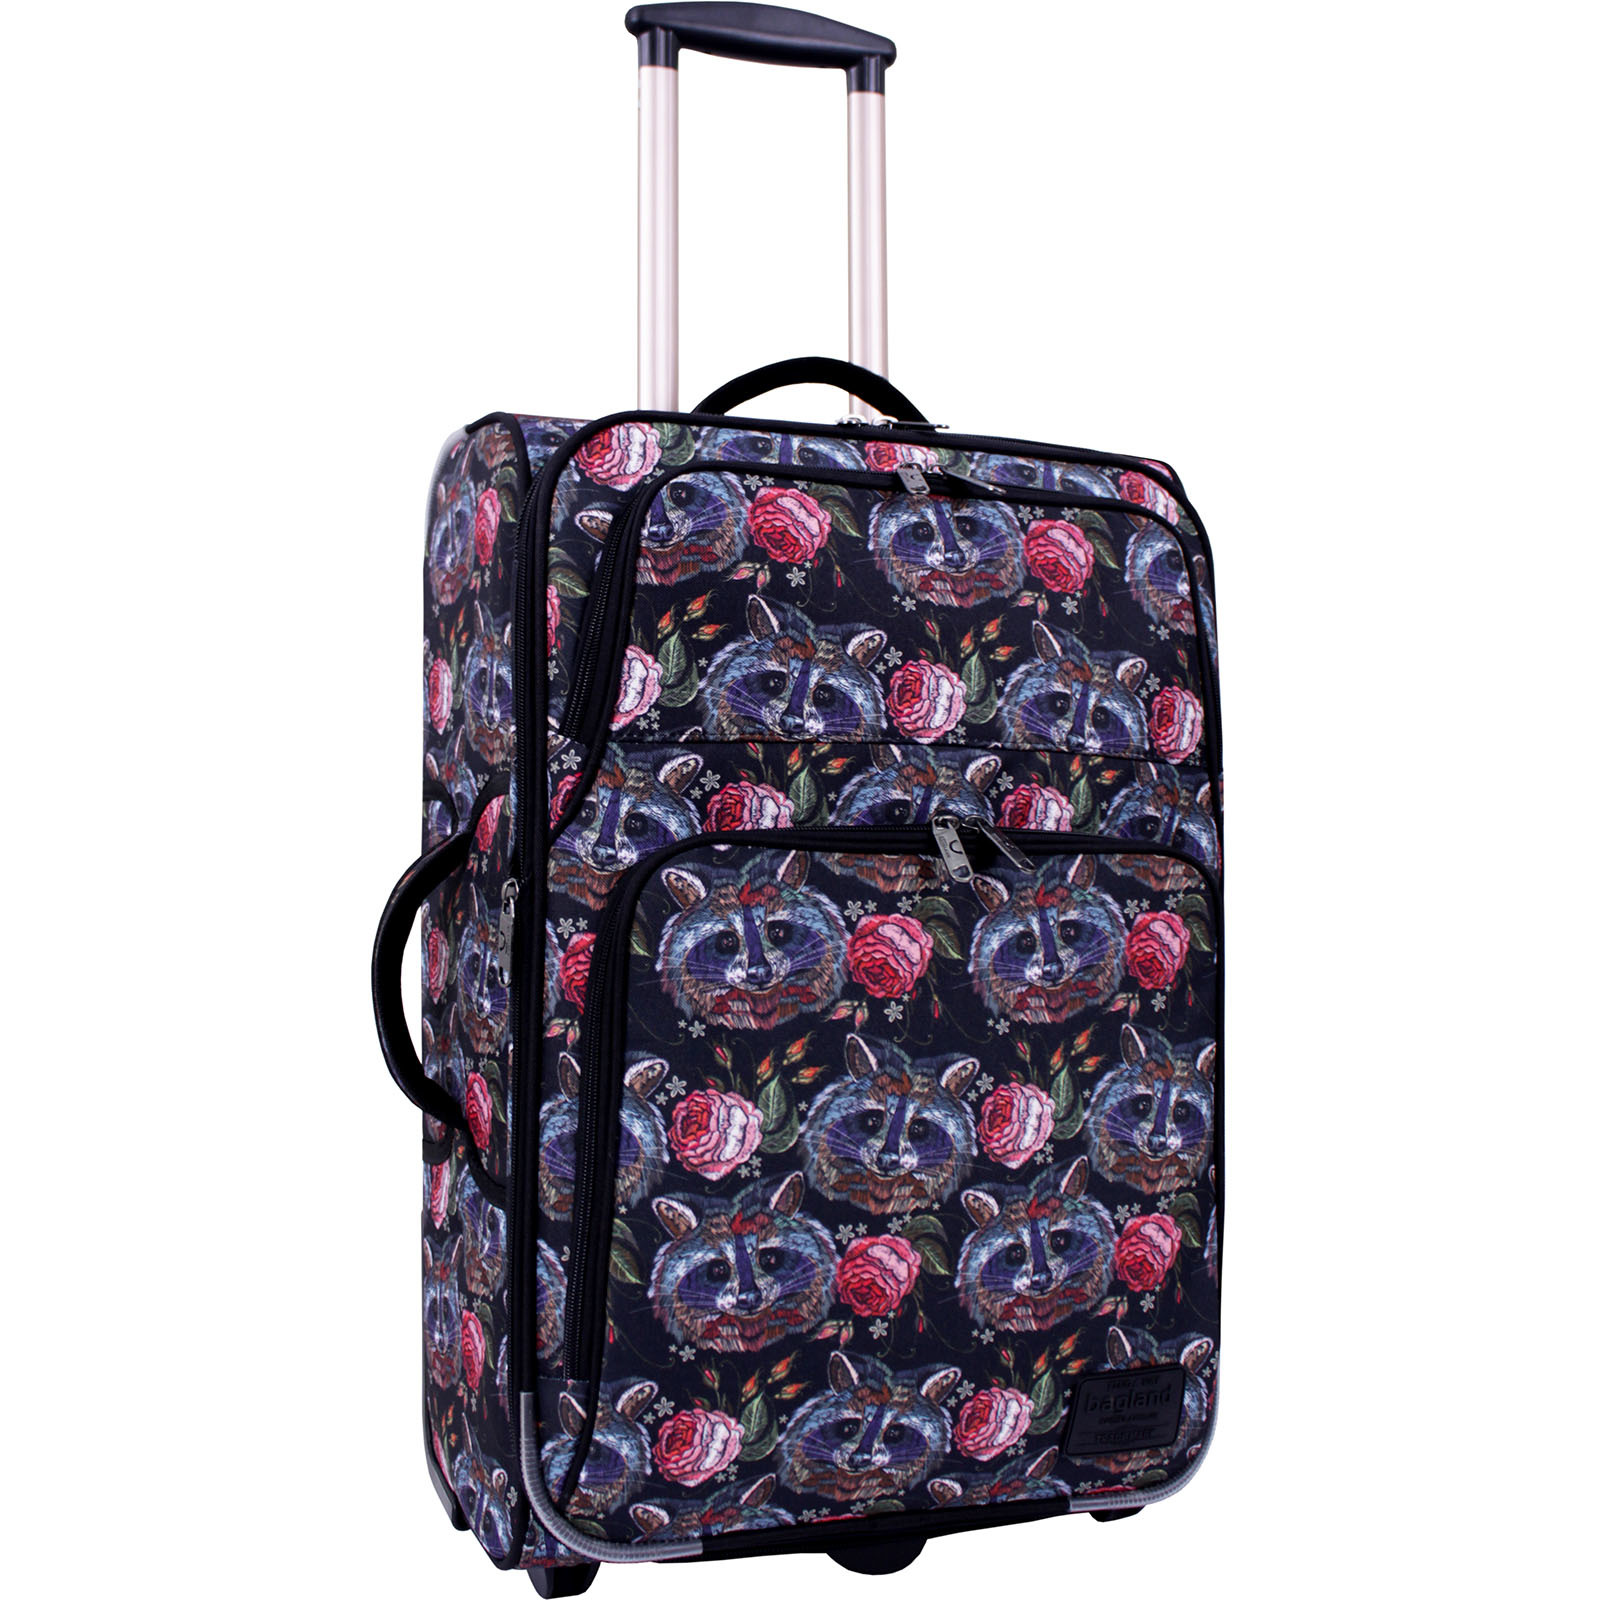 Дорожные чемоданы Чемодан Bagland Леон средний дизайн 51 л. сублімація 477 (0037666244) IMG_4729_суб.477_.JPG